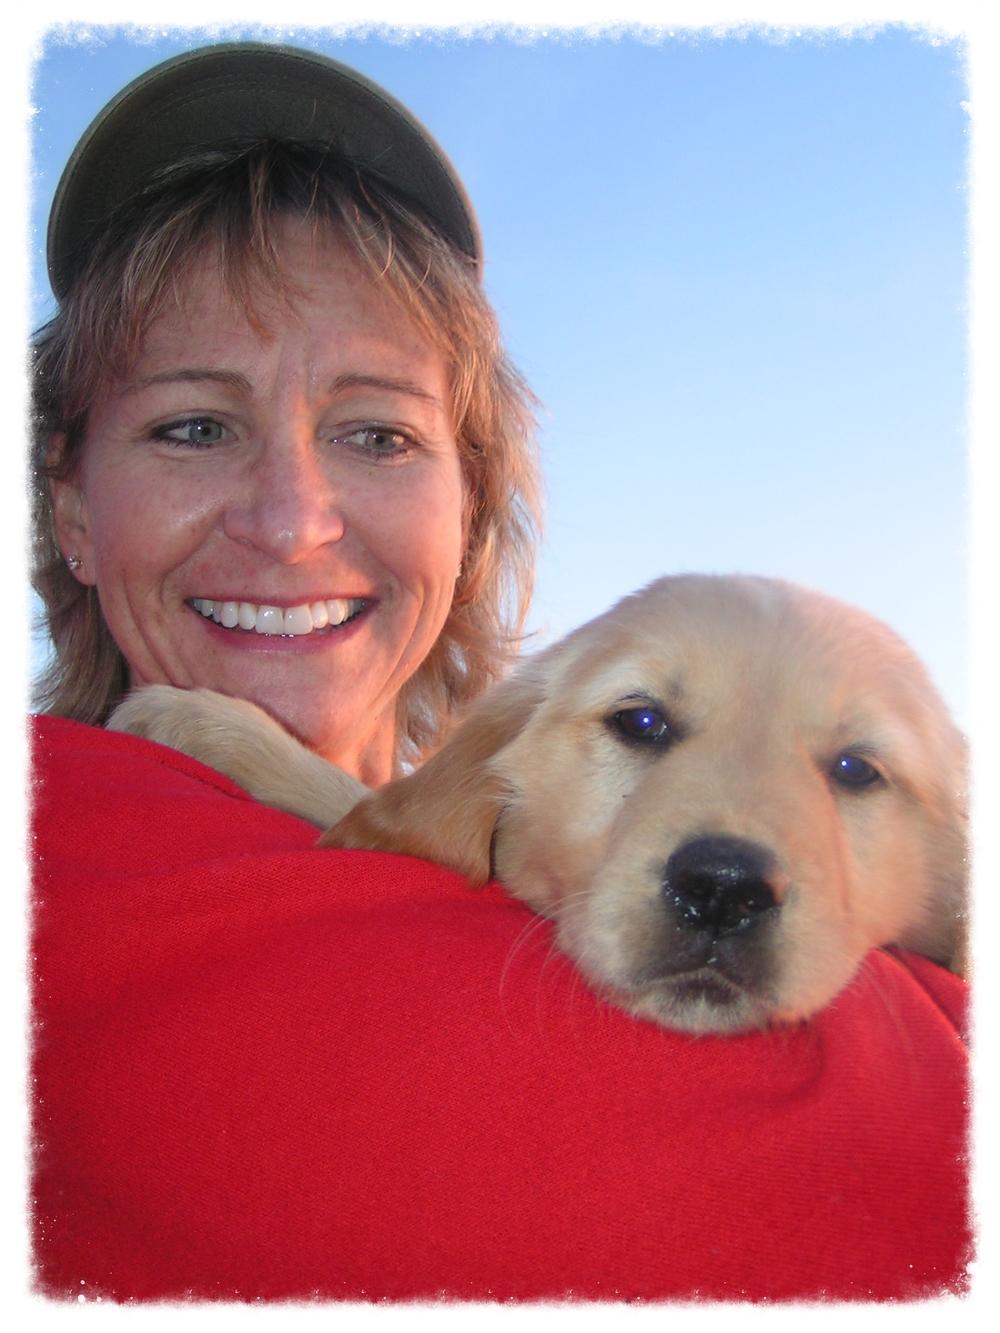 Cheryl and her dog kid Mailea